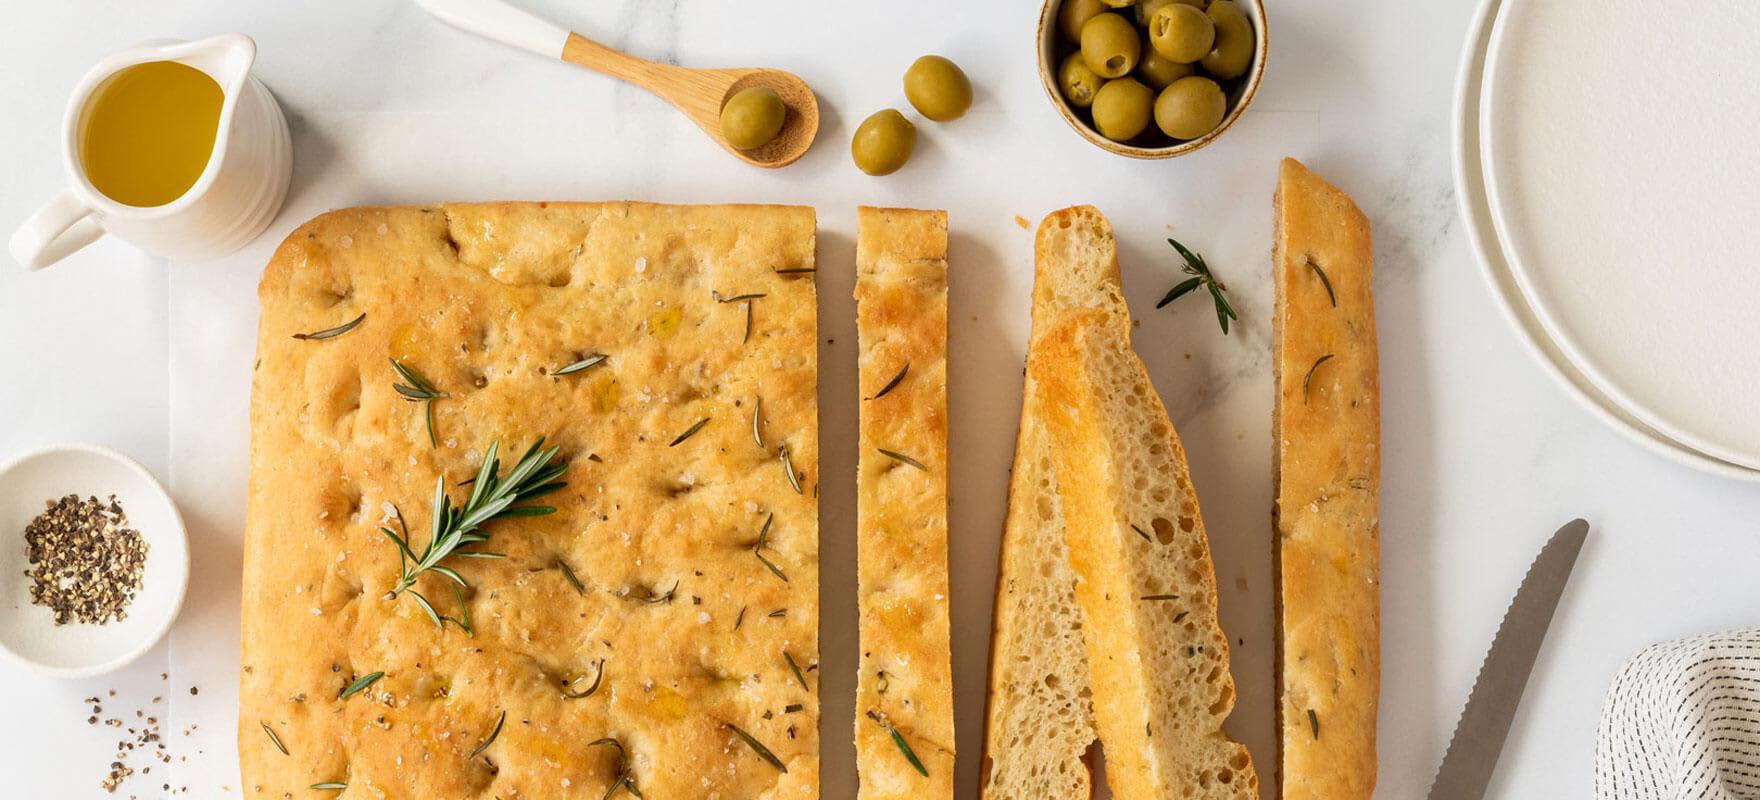 Easy focaccia bread image 1